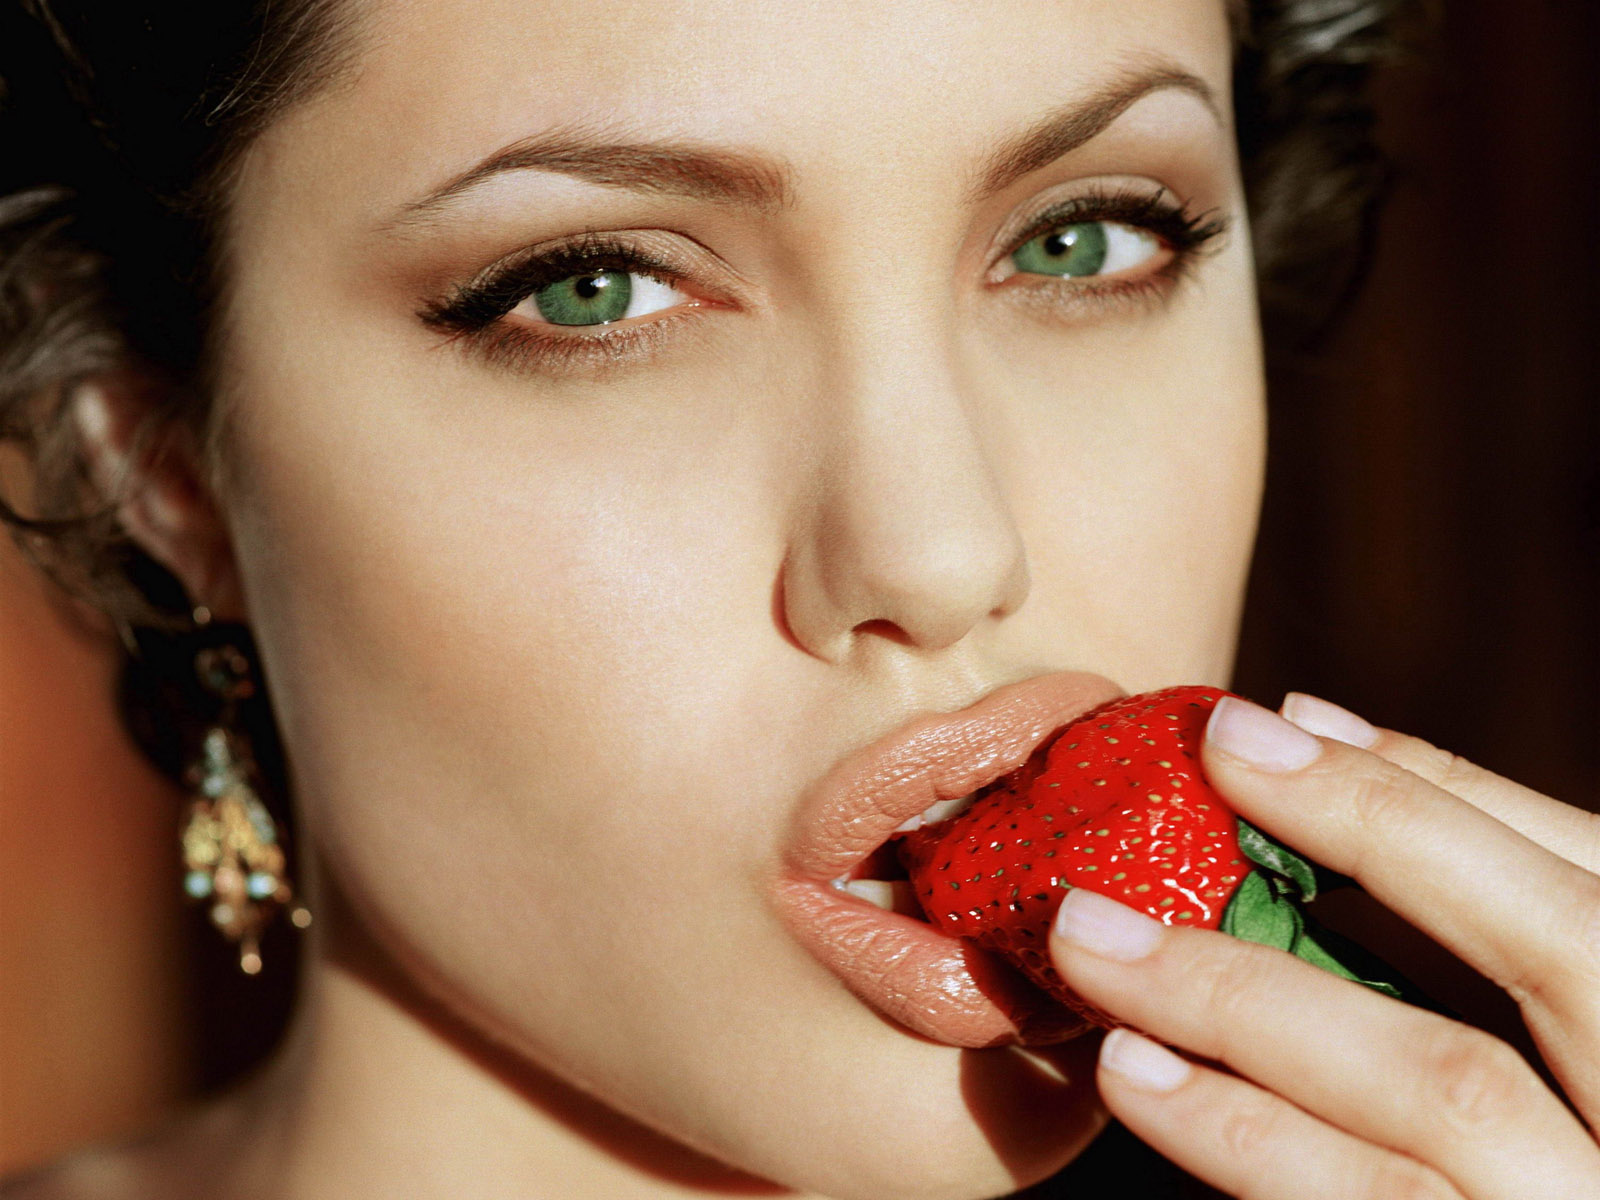 http://4.bp.blogspot.com/-saEu24he3fE/ToCk_CycL8I/AAAAAAAAClI/WAkJKrqIQ7c/s1600/Angelina-Jolie-Tasting-Fresh-Strawberry.jpg